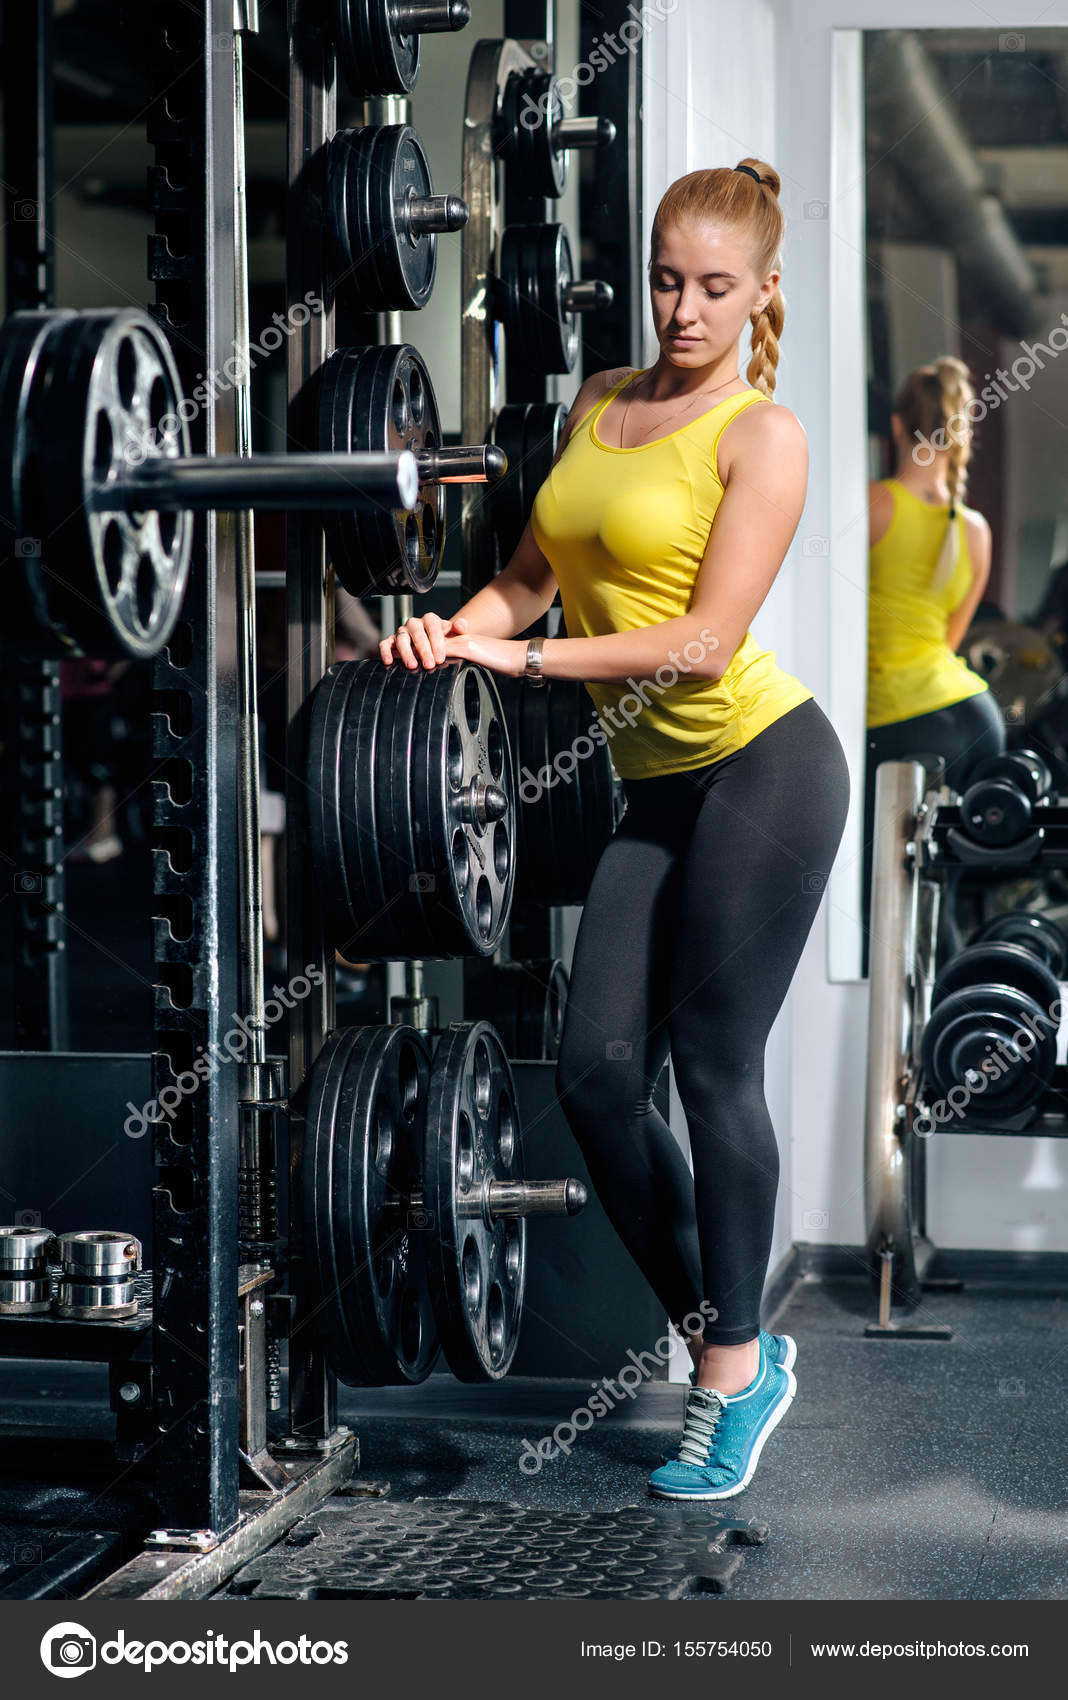 Como hacer una dieta fitness